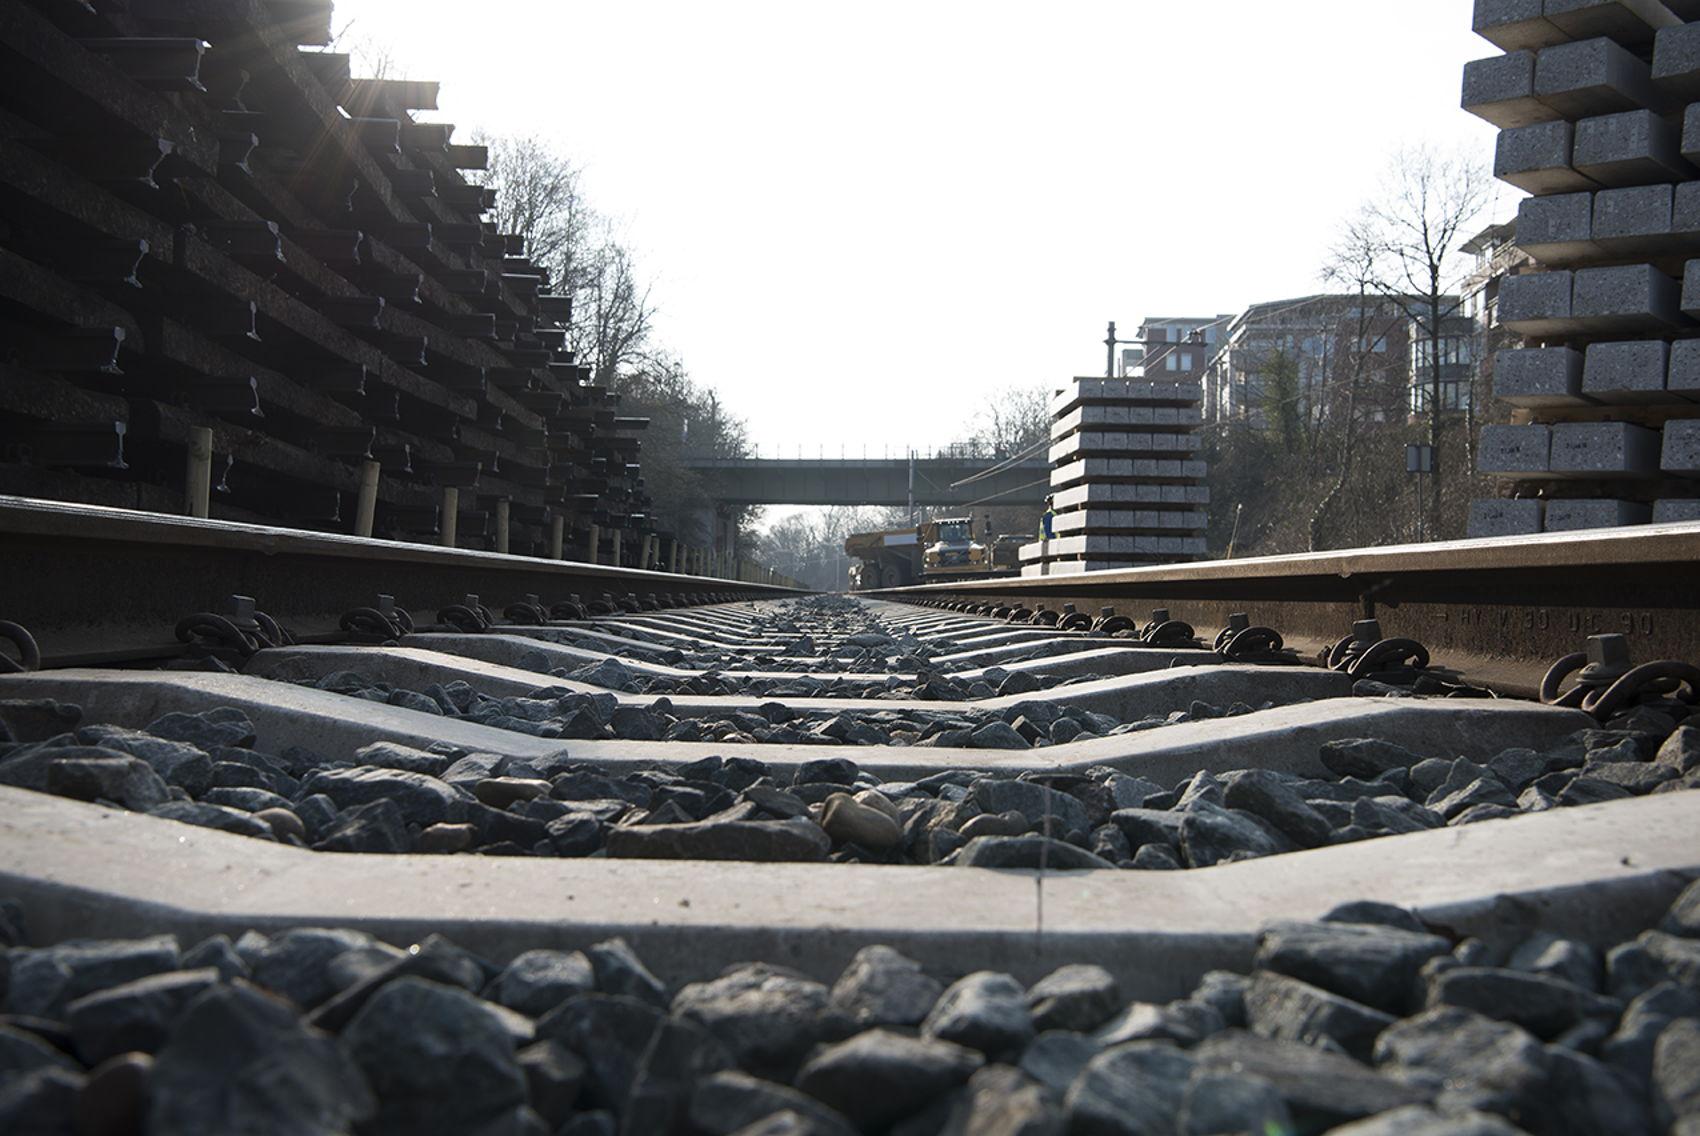 Spoorverdubbeling Heerlen – Landgraaf: waar staan we nu?